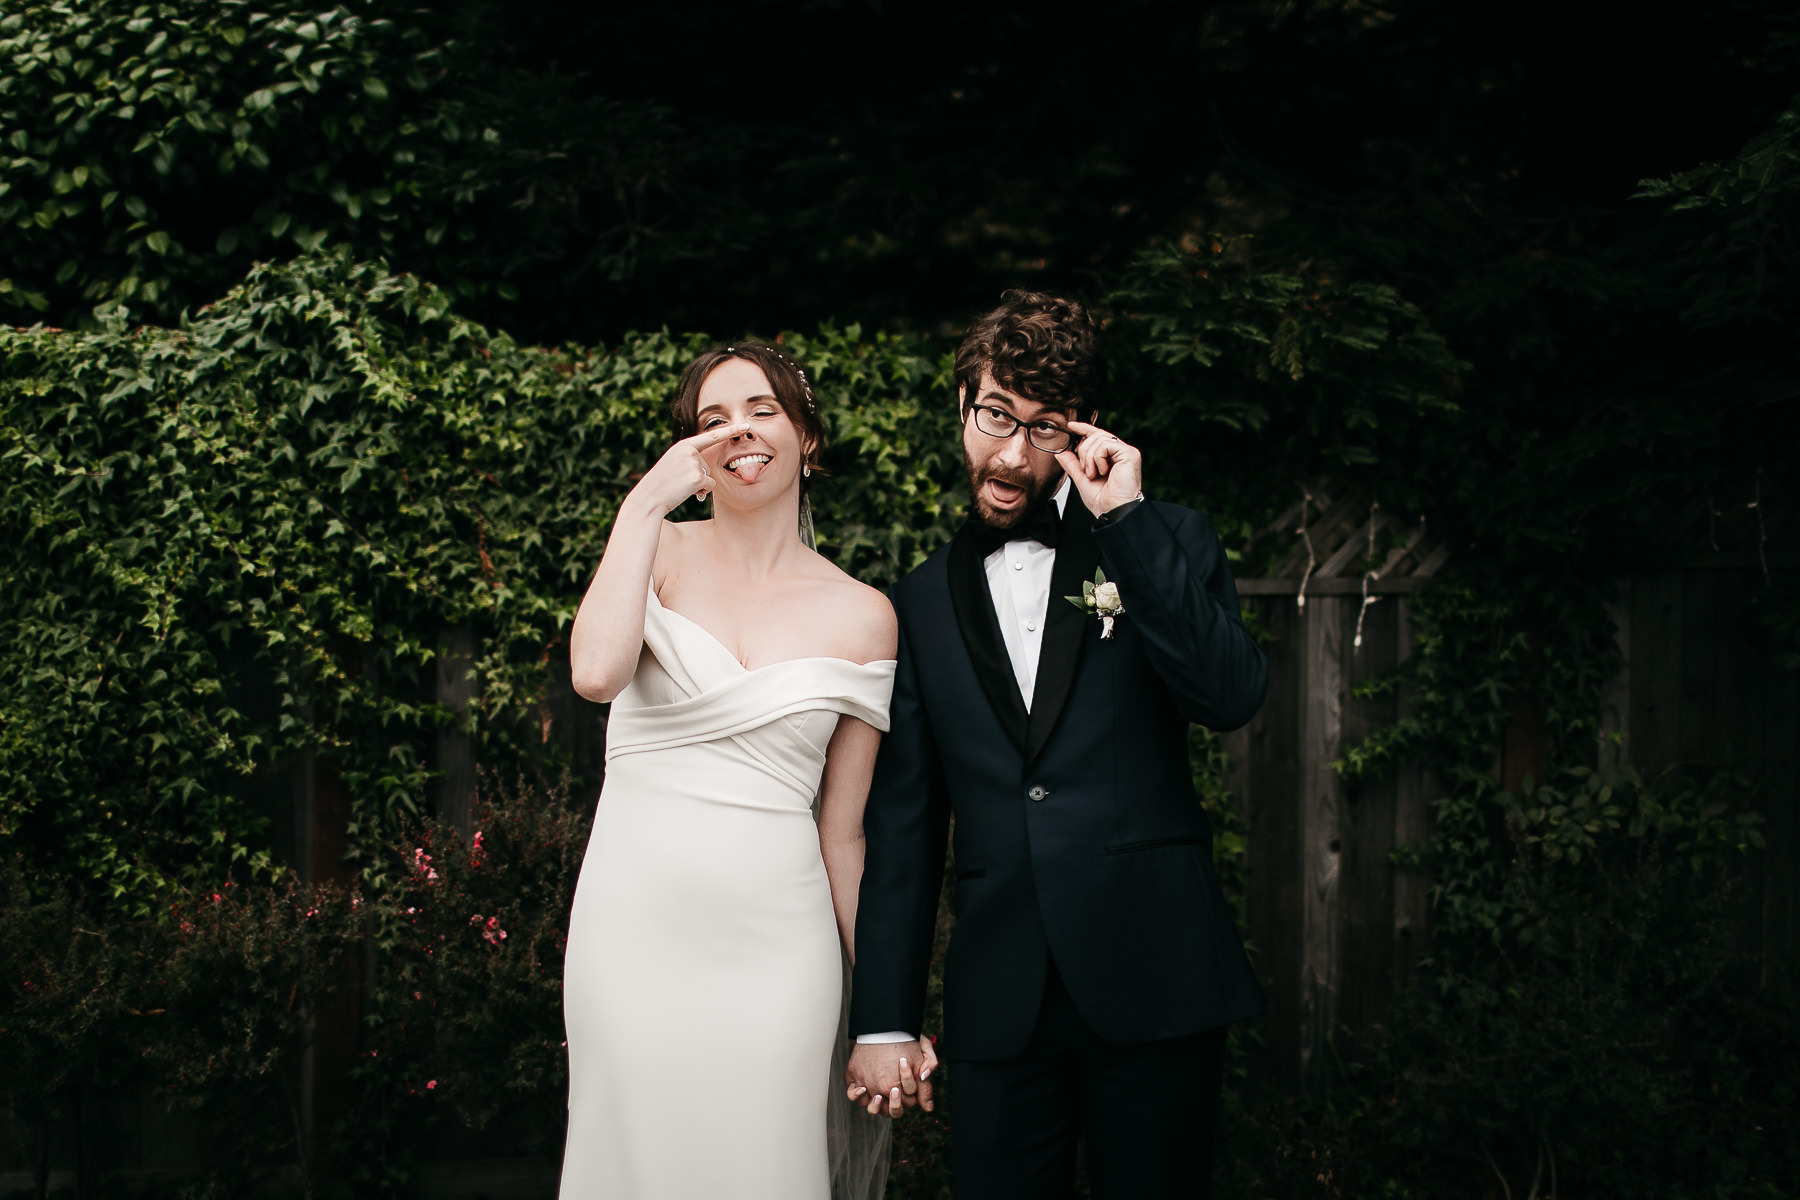 bodega-bay-secret-garden-gloomy-fall-wedding-114